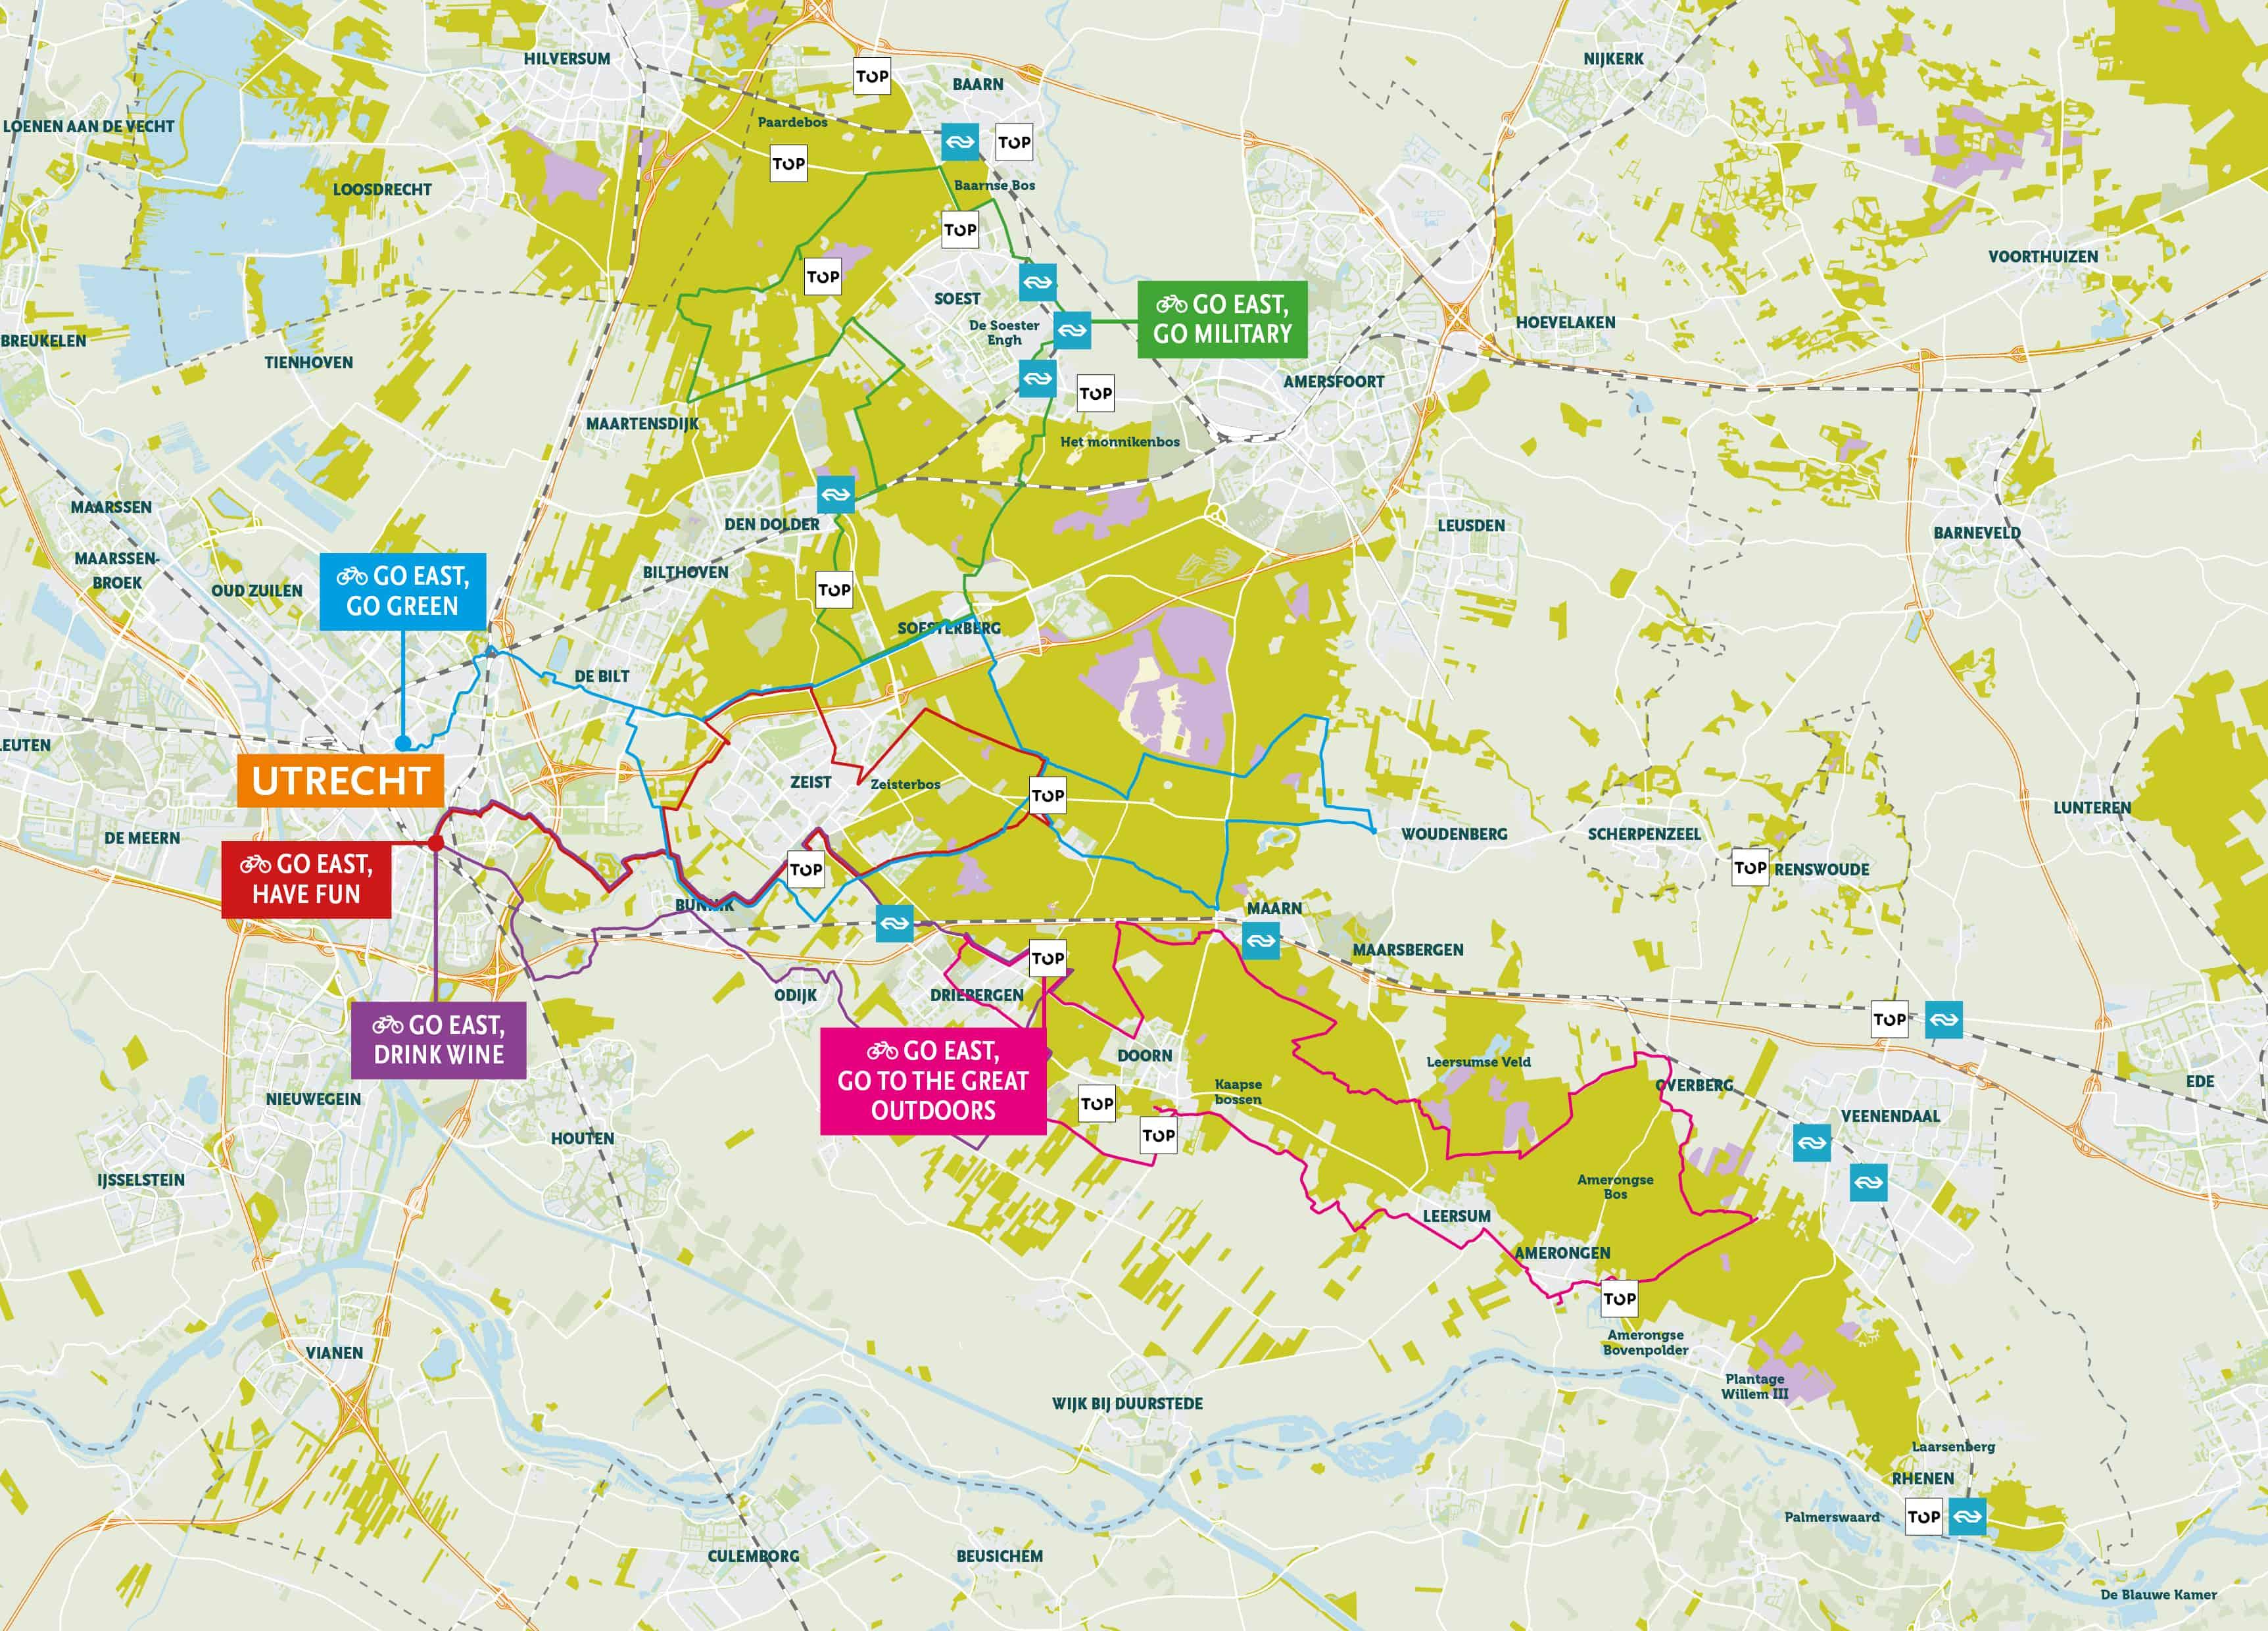 Plattegrond cycling utrecht region